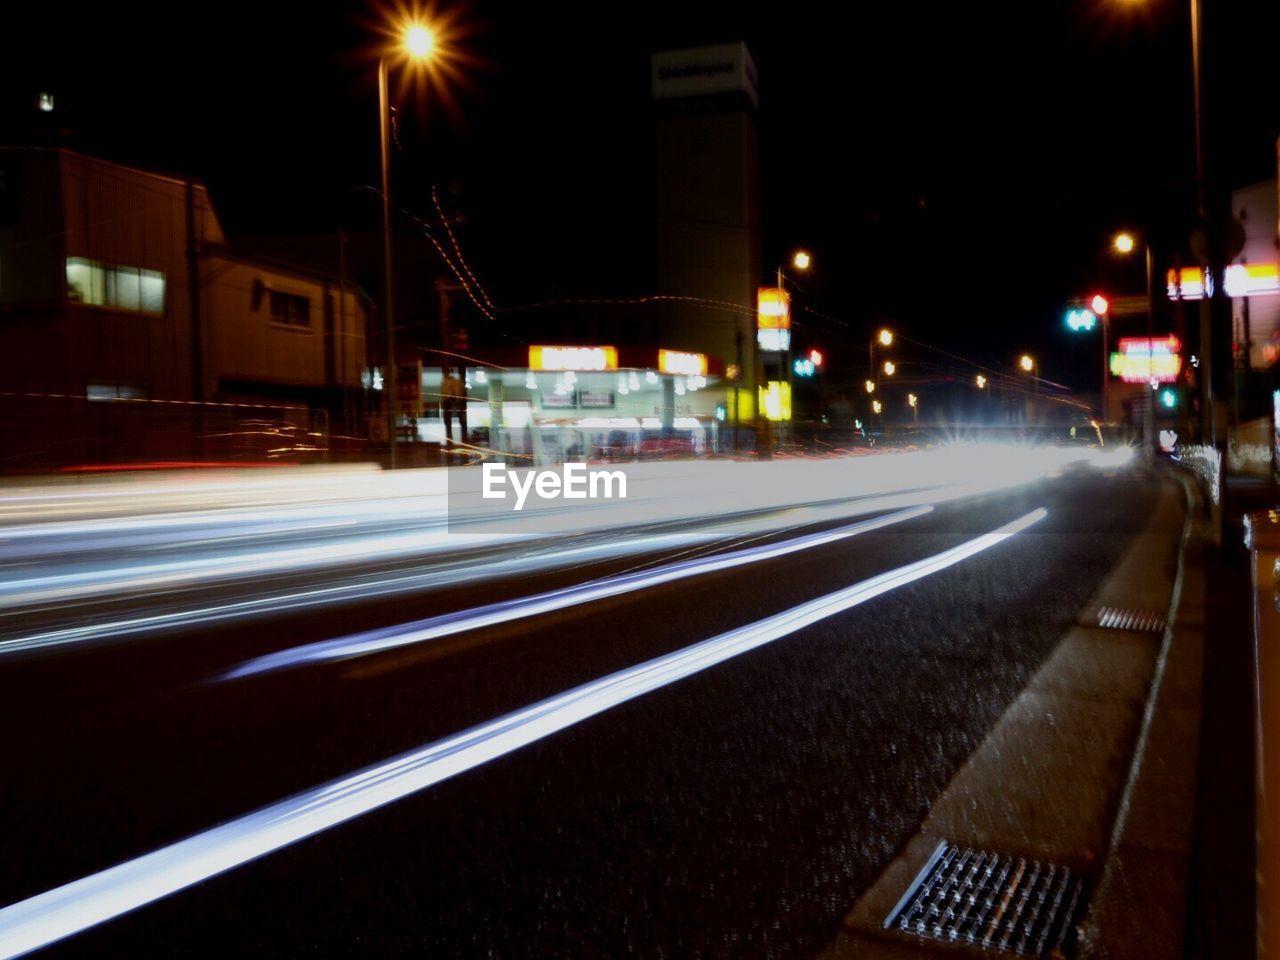 night, illuminated, long exposure, motion, speed, street, light trail, blurred motion, road, high street, street light, transportation, urban scene, no people, city, building exterior, outdoors, architecture